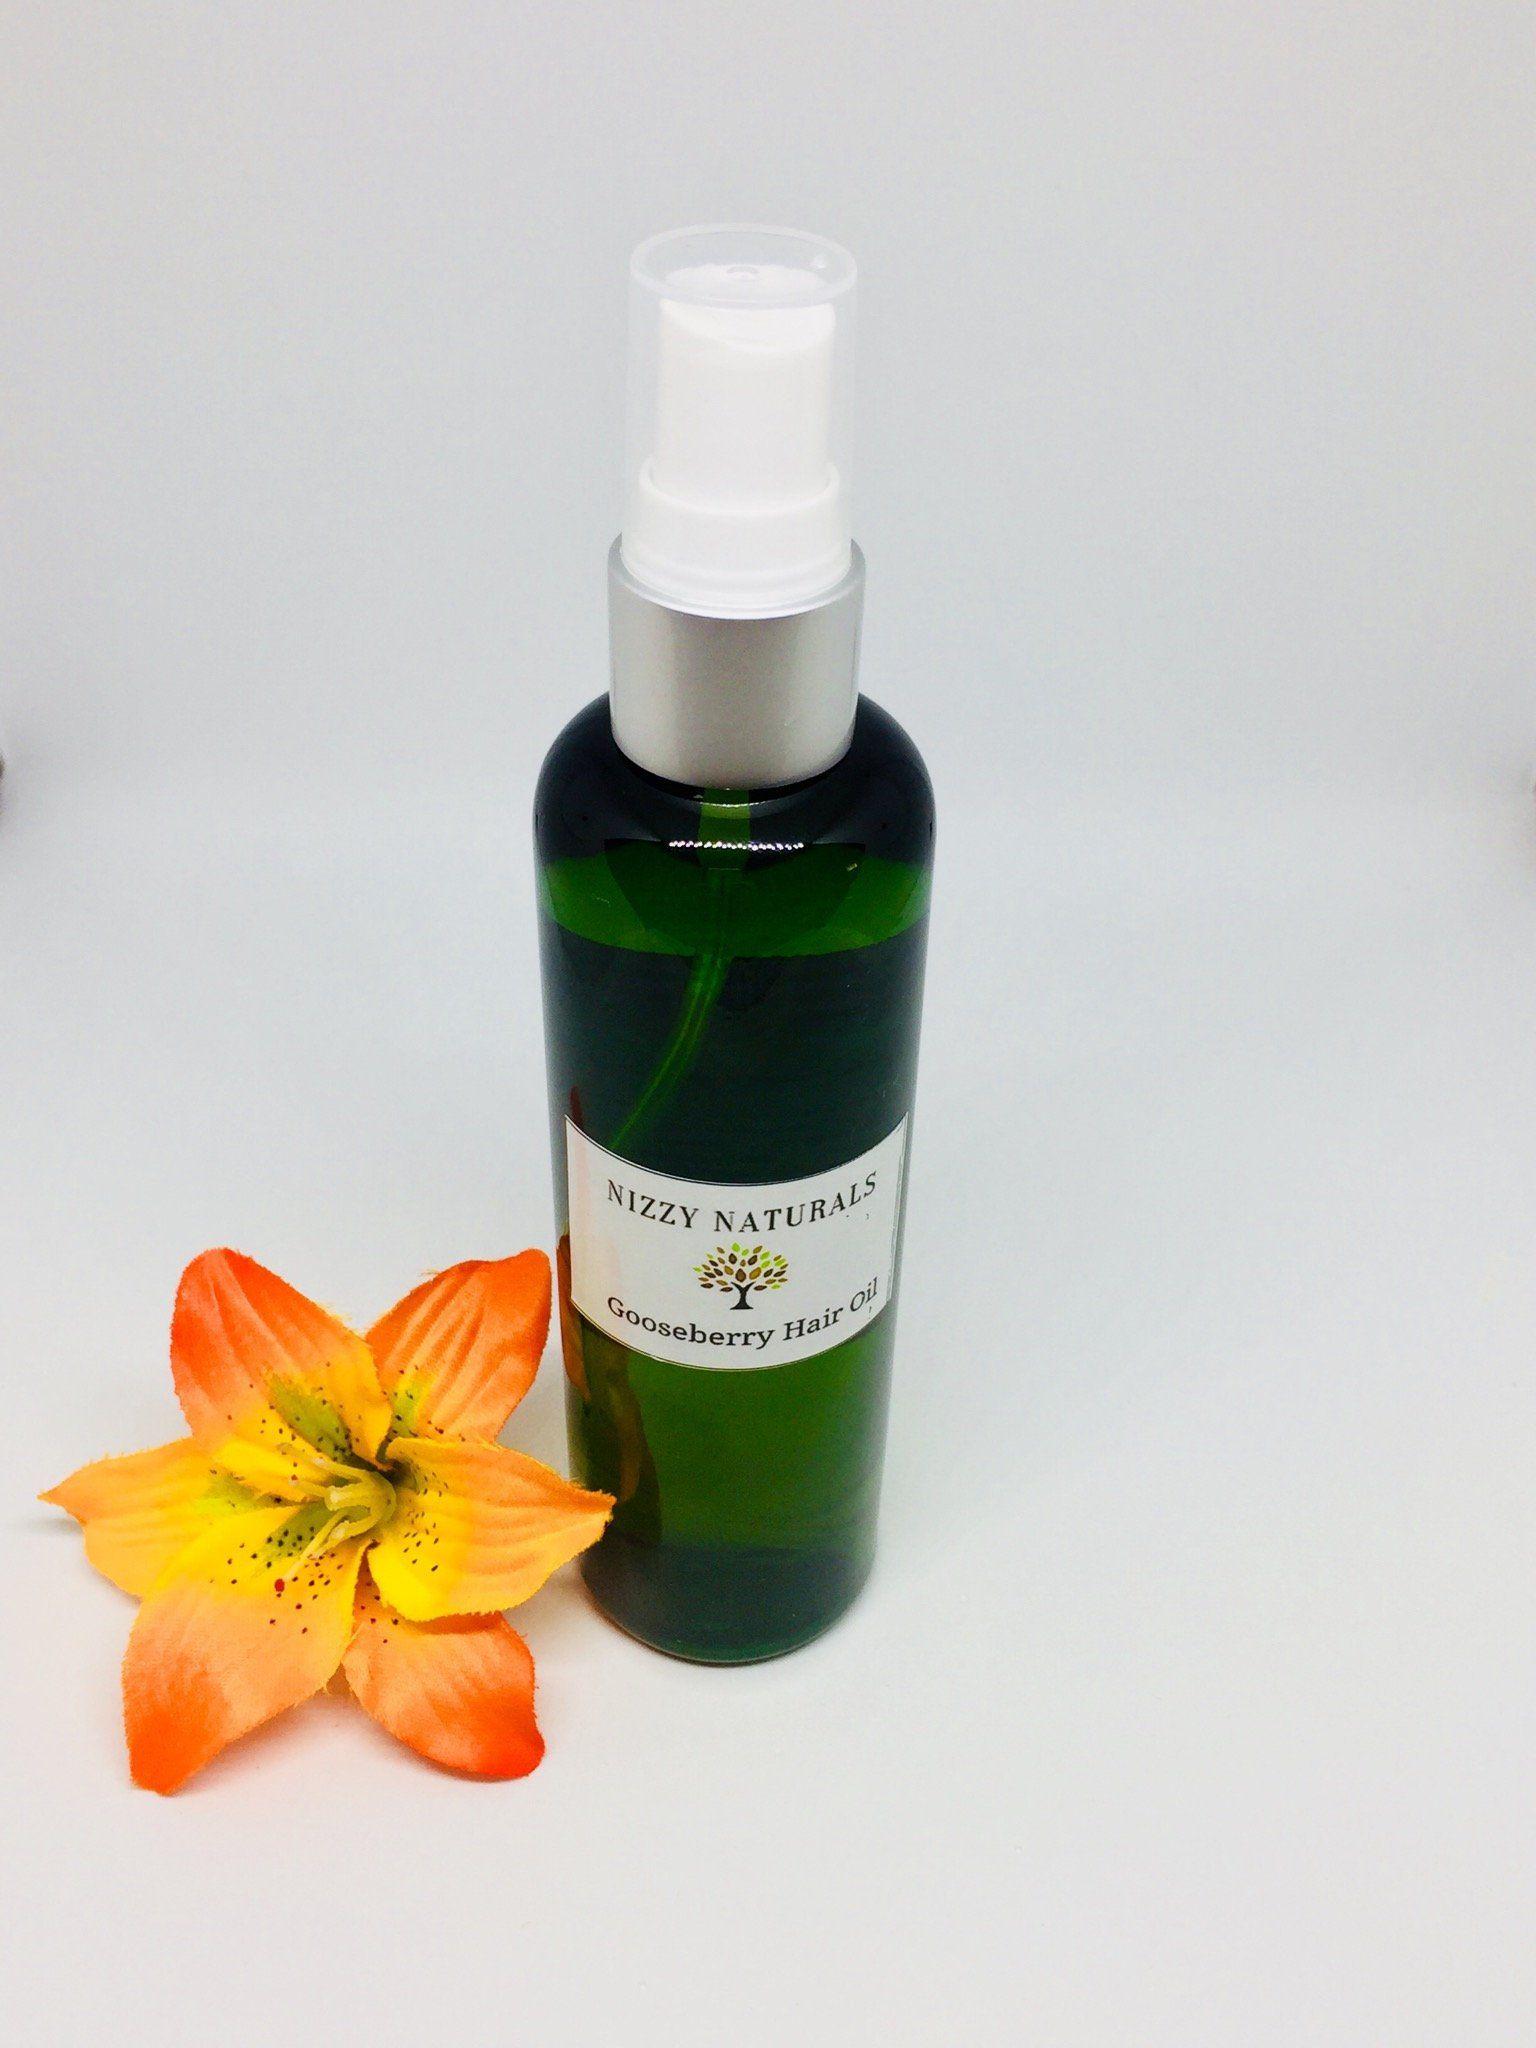 Natural Hair Growth Oil for Natural Hair, Hair Oil for